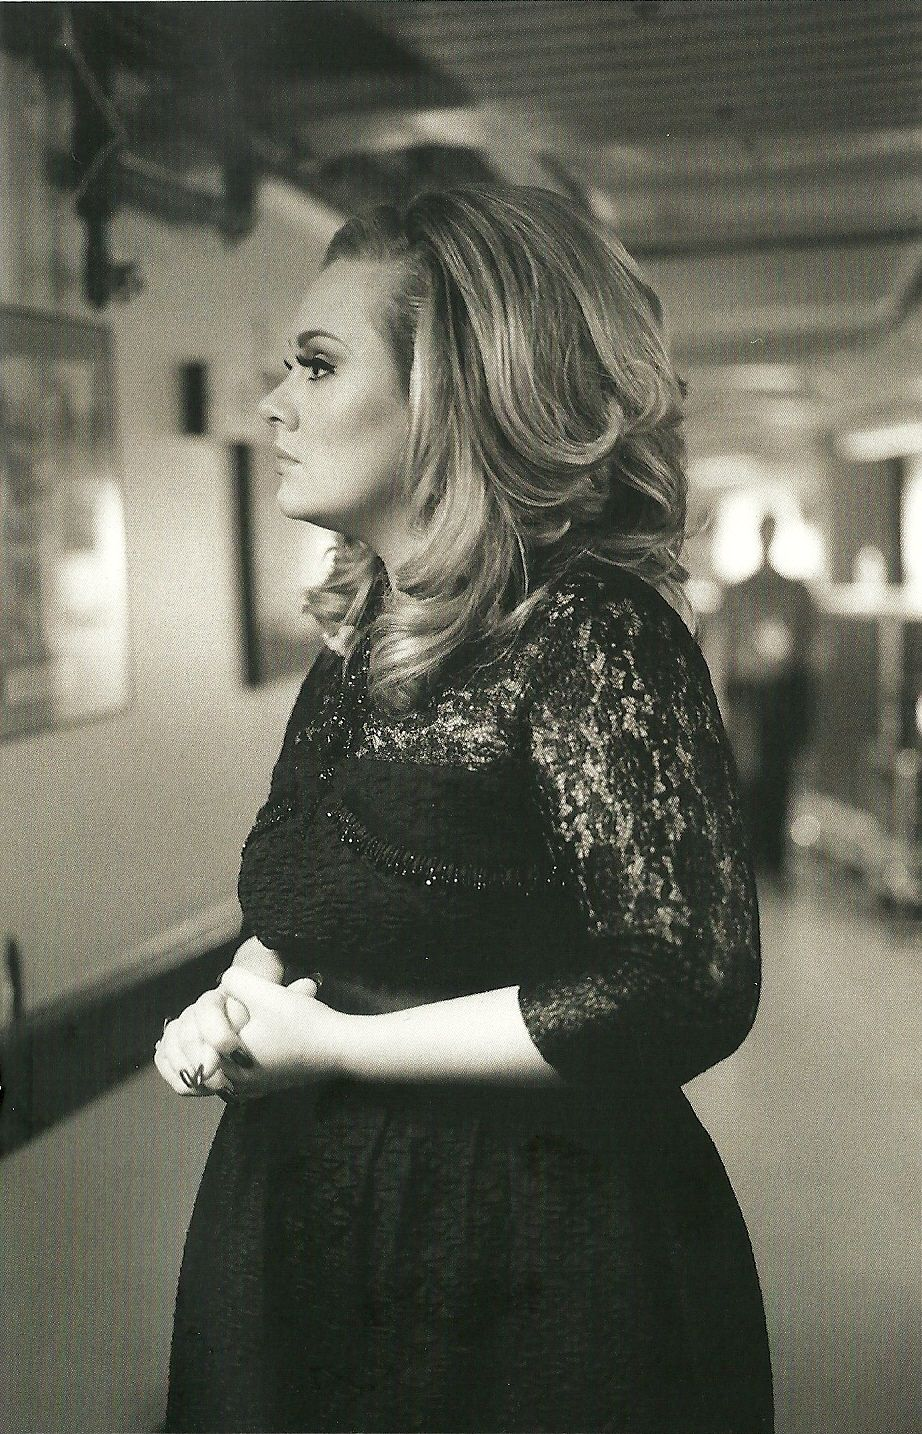 Adele Live At The Royal Albert Hall Adele Adkins Adele Adele